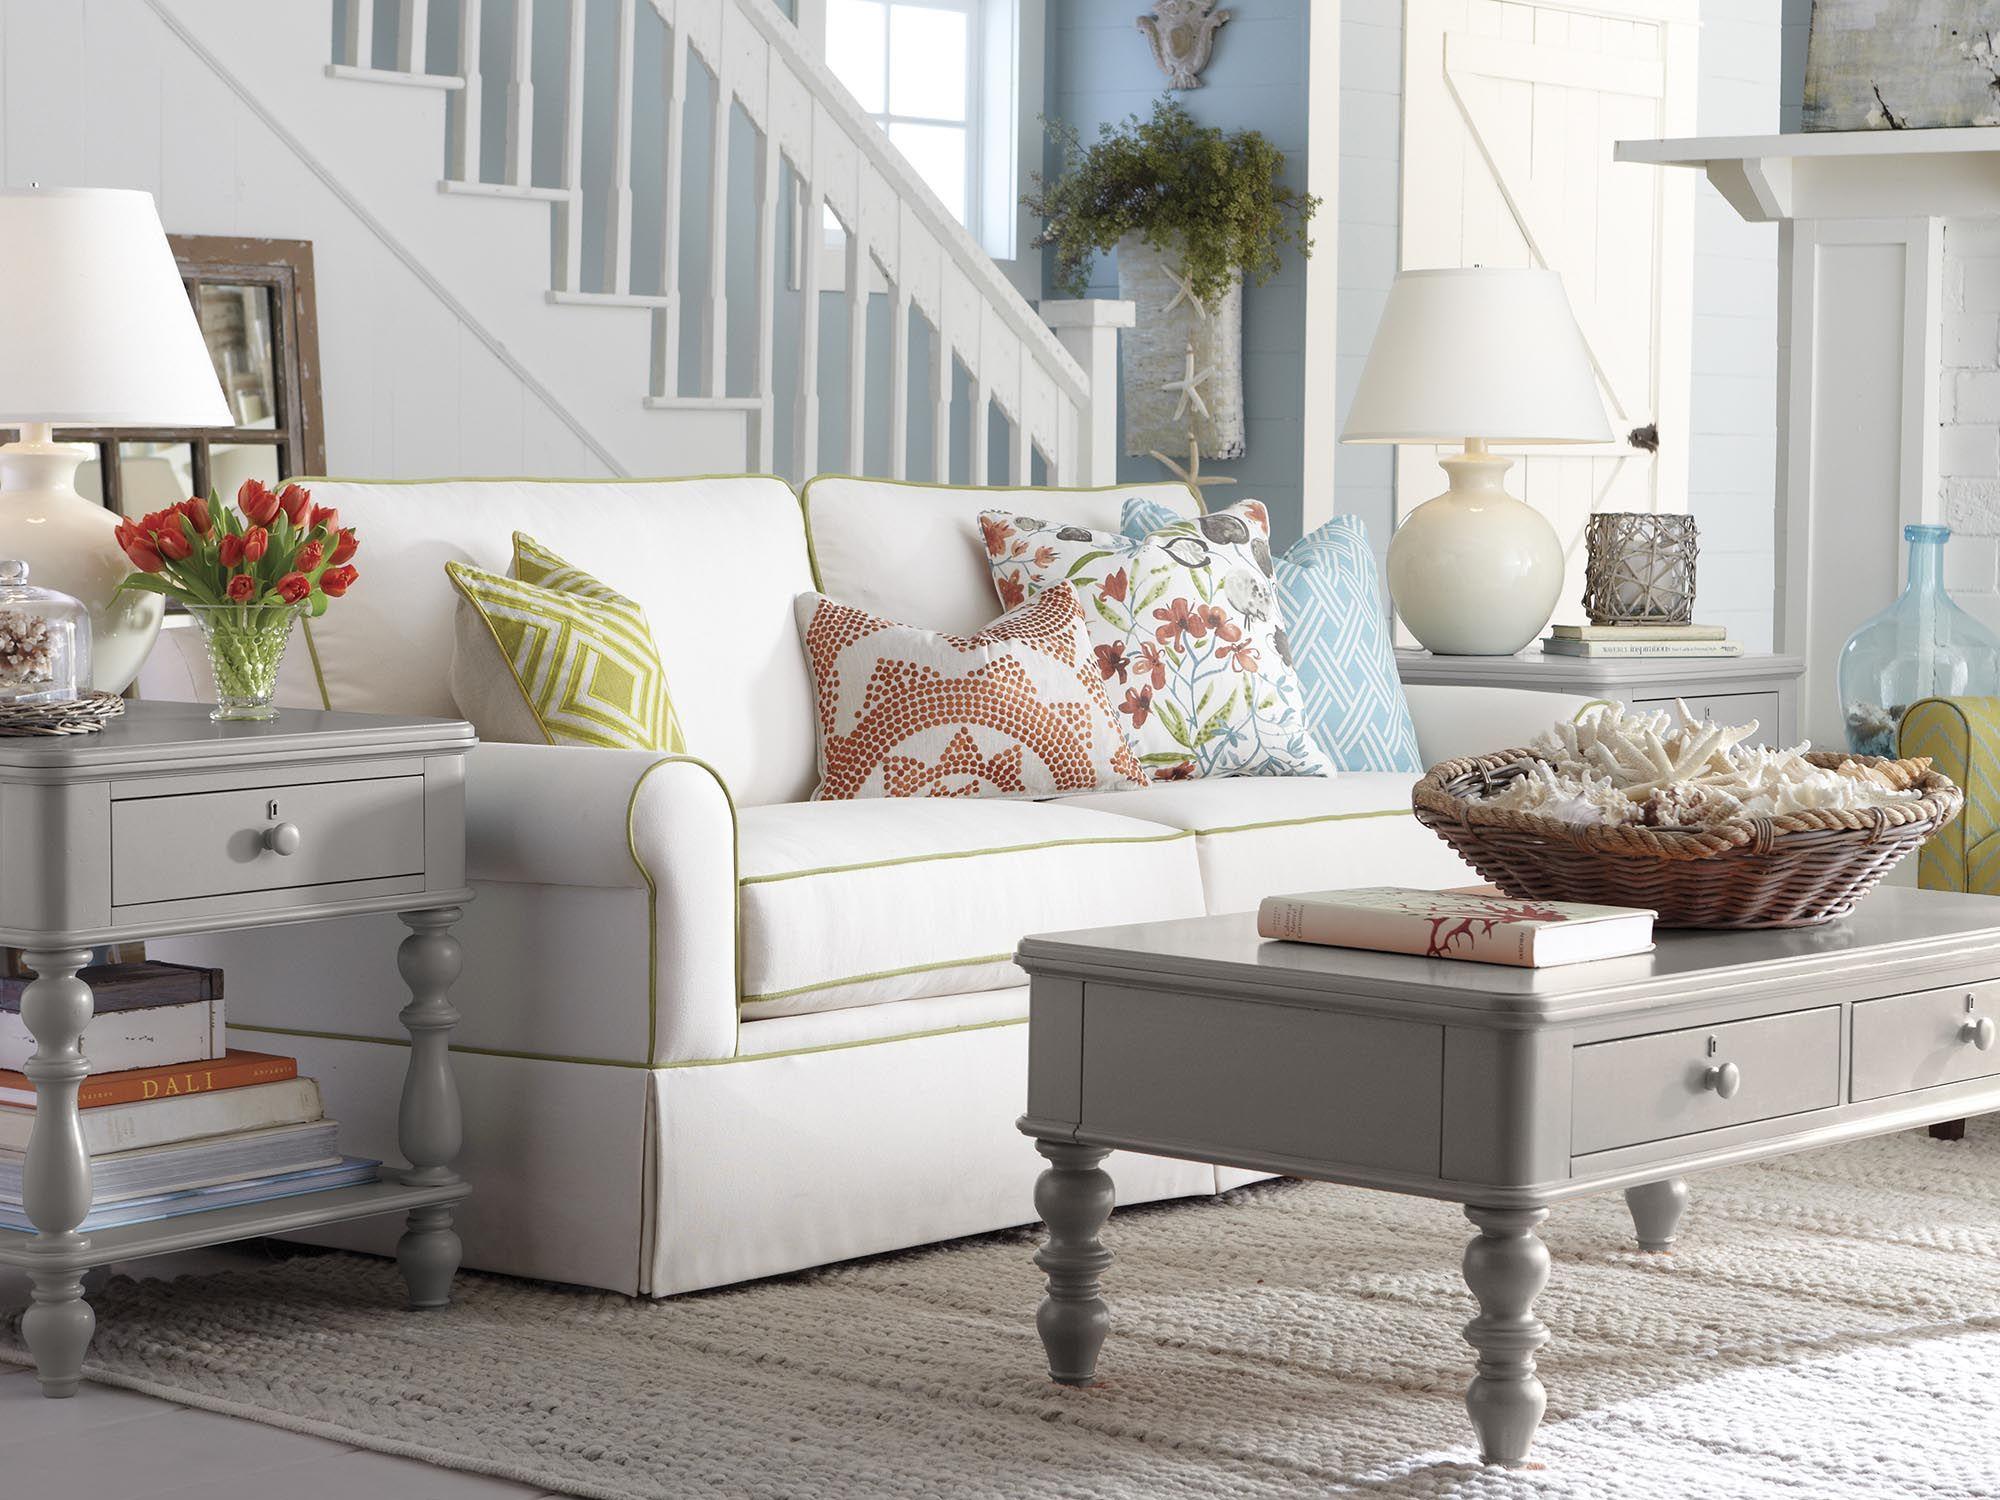 Living Sleeper Sofas Fabric Seating Sofa design